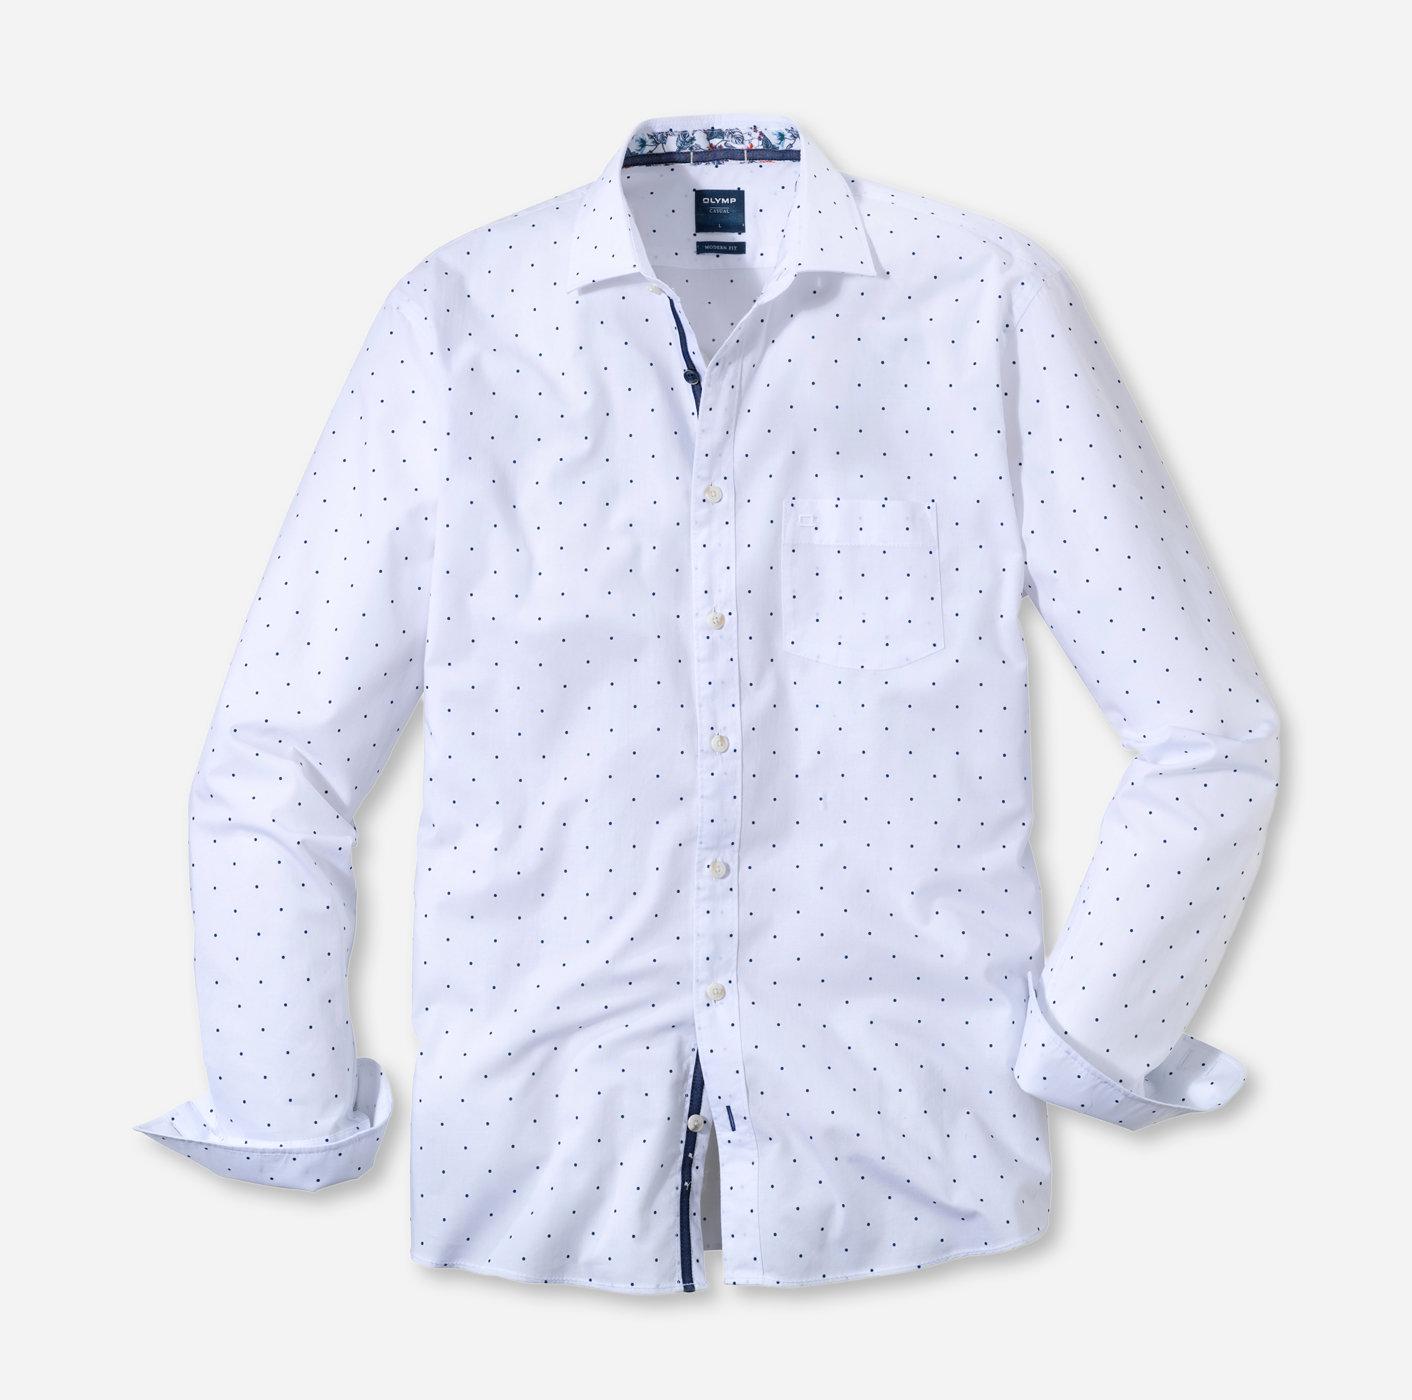 8c904bdf4616 OLYMP Casual modern fit Kent White - 40153400